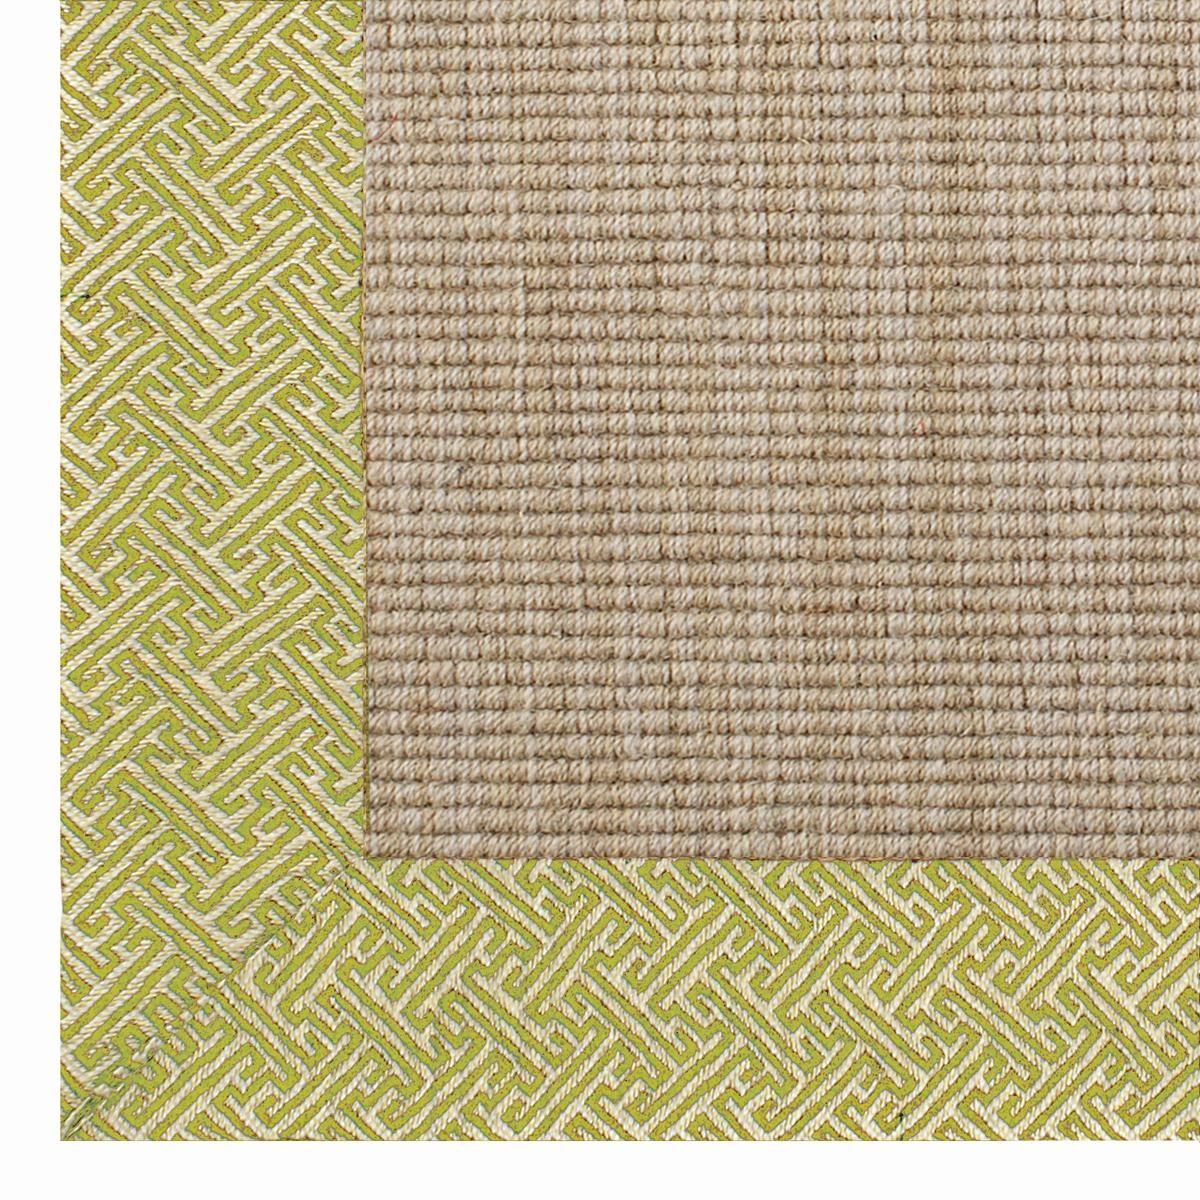 Geometric Border Wool Sisal Rug: 4 Colors